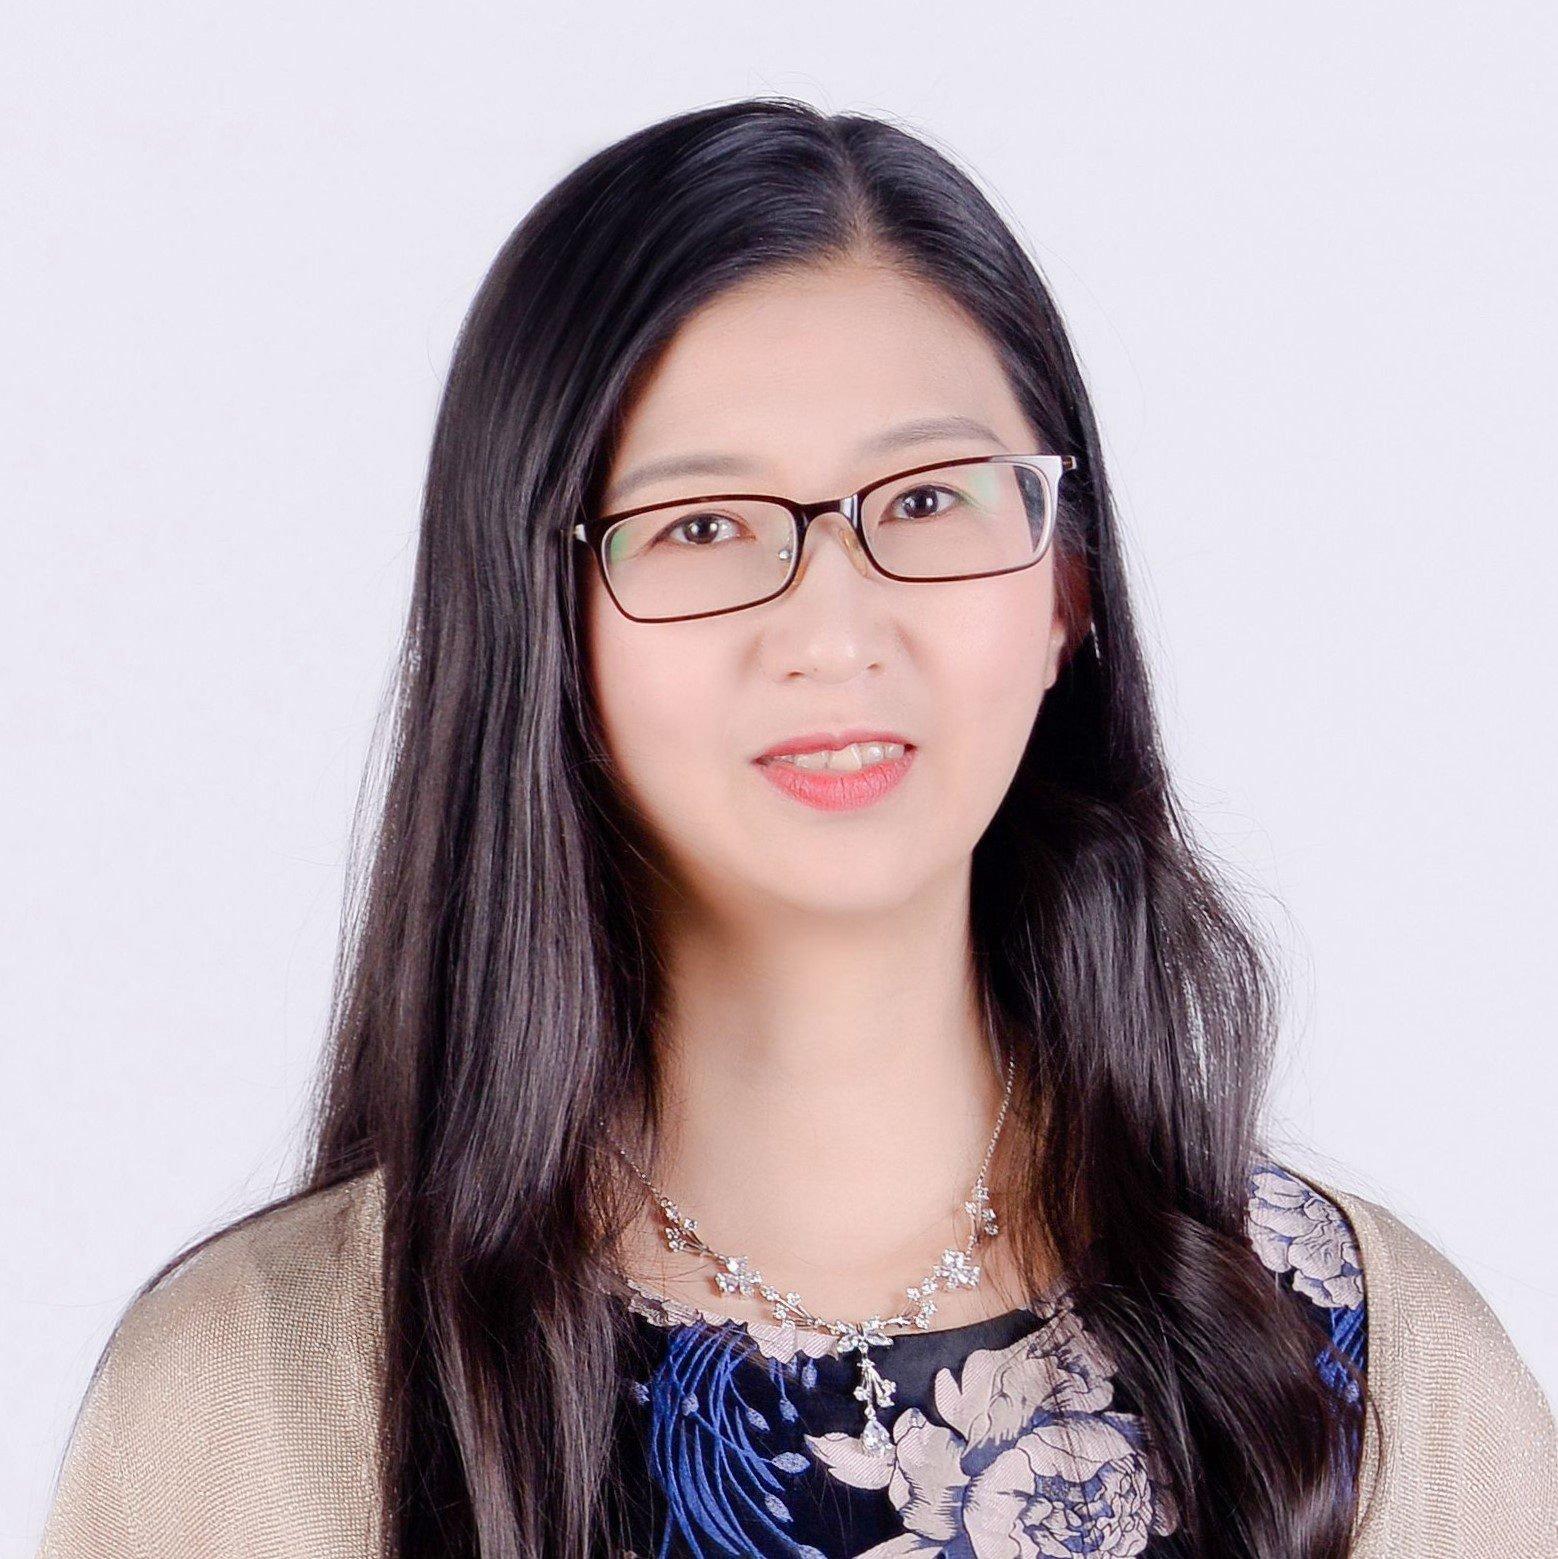 钱颖 Ying Qian (Iris)